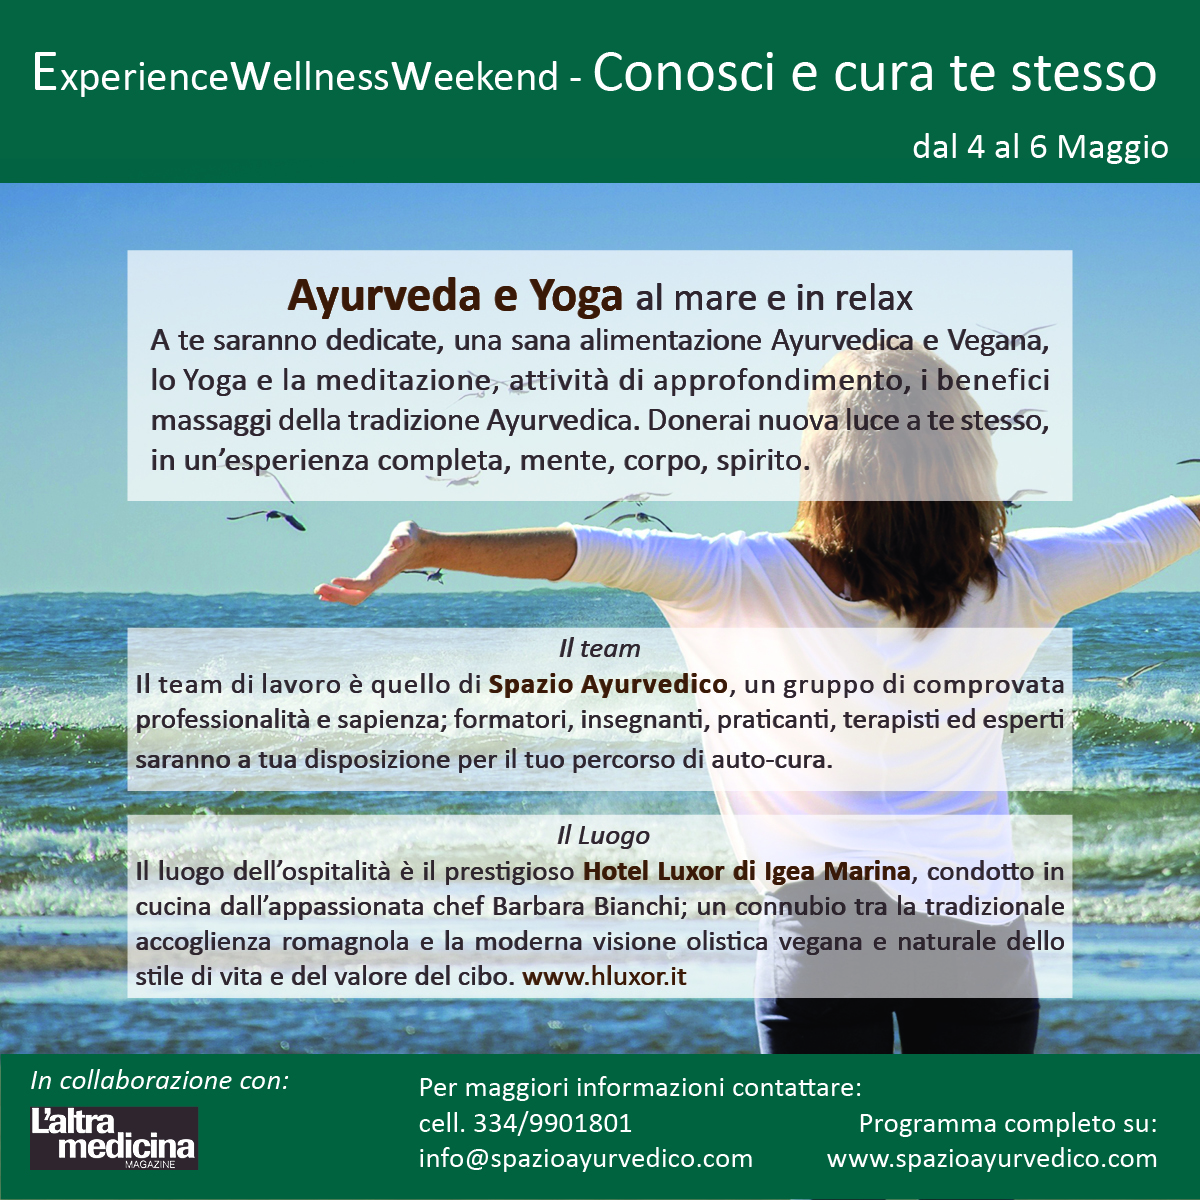 wellness weekend 4-6 maggio con programma leggeri